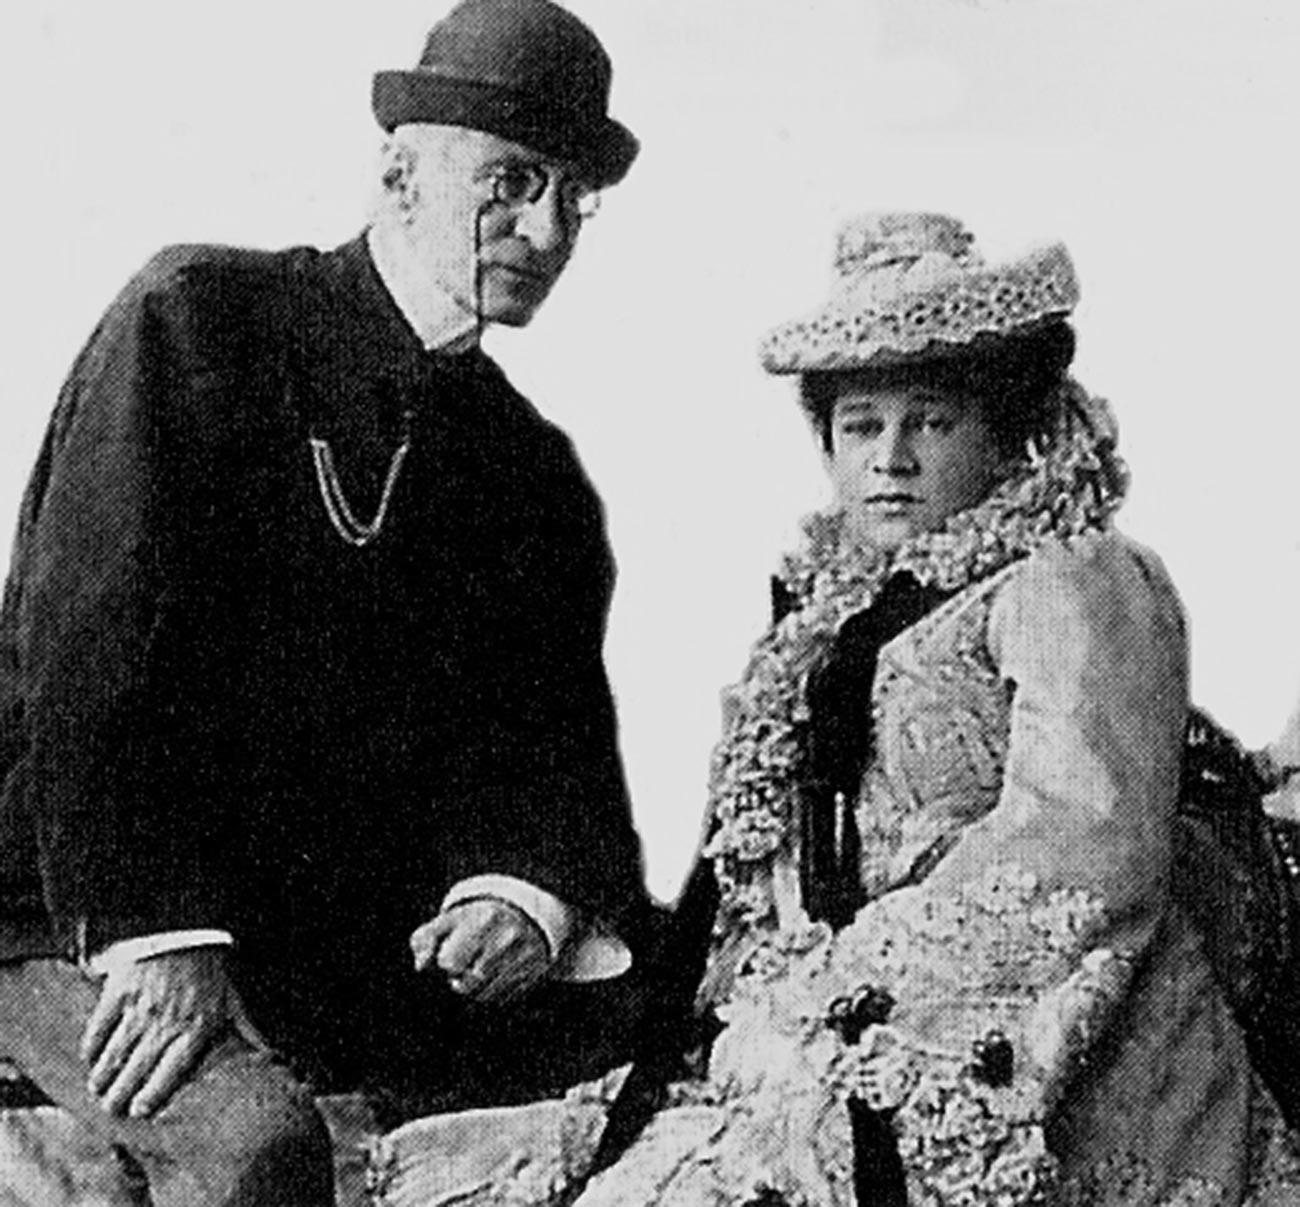 Grand Duke Nicholas Konstantinovich and his wife Nadezhda Dreyer, later the Duchess Iskander